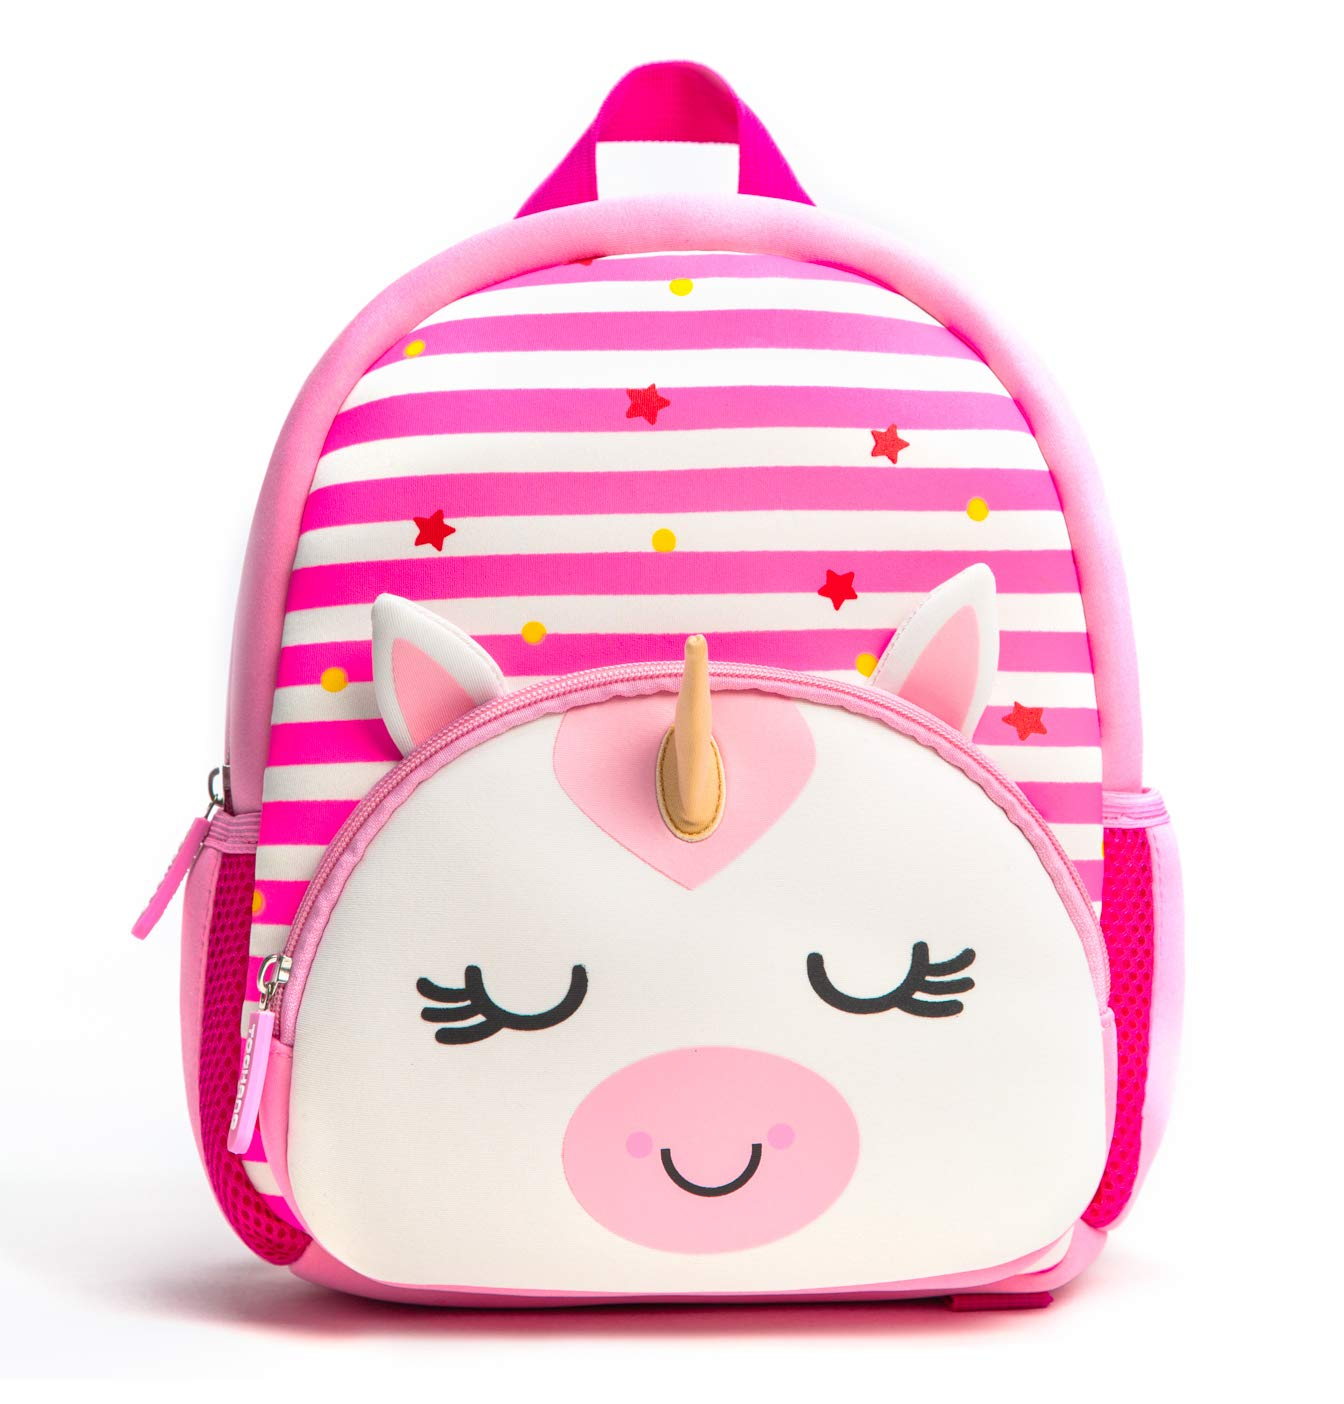 Toddler Backpack, Waterproof Preschool Backpack, 3D Cute Cartoon Neoprene Animal Schoolbag for Kids, Lunch Box Carry Bag for 1-6 Years Boys Girls, Unicorn by KK CRAFTS